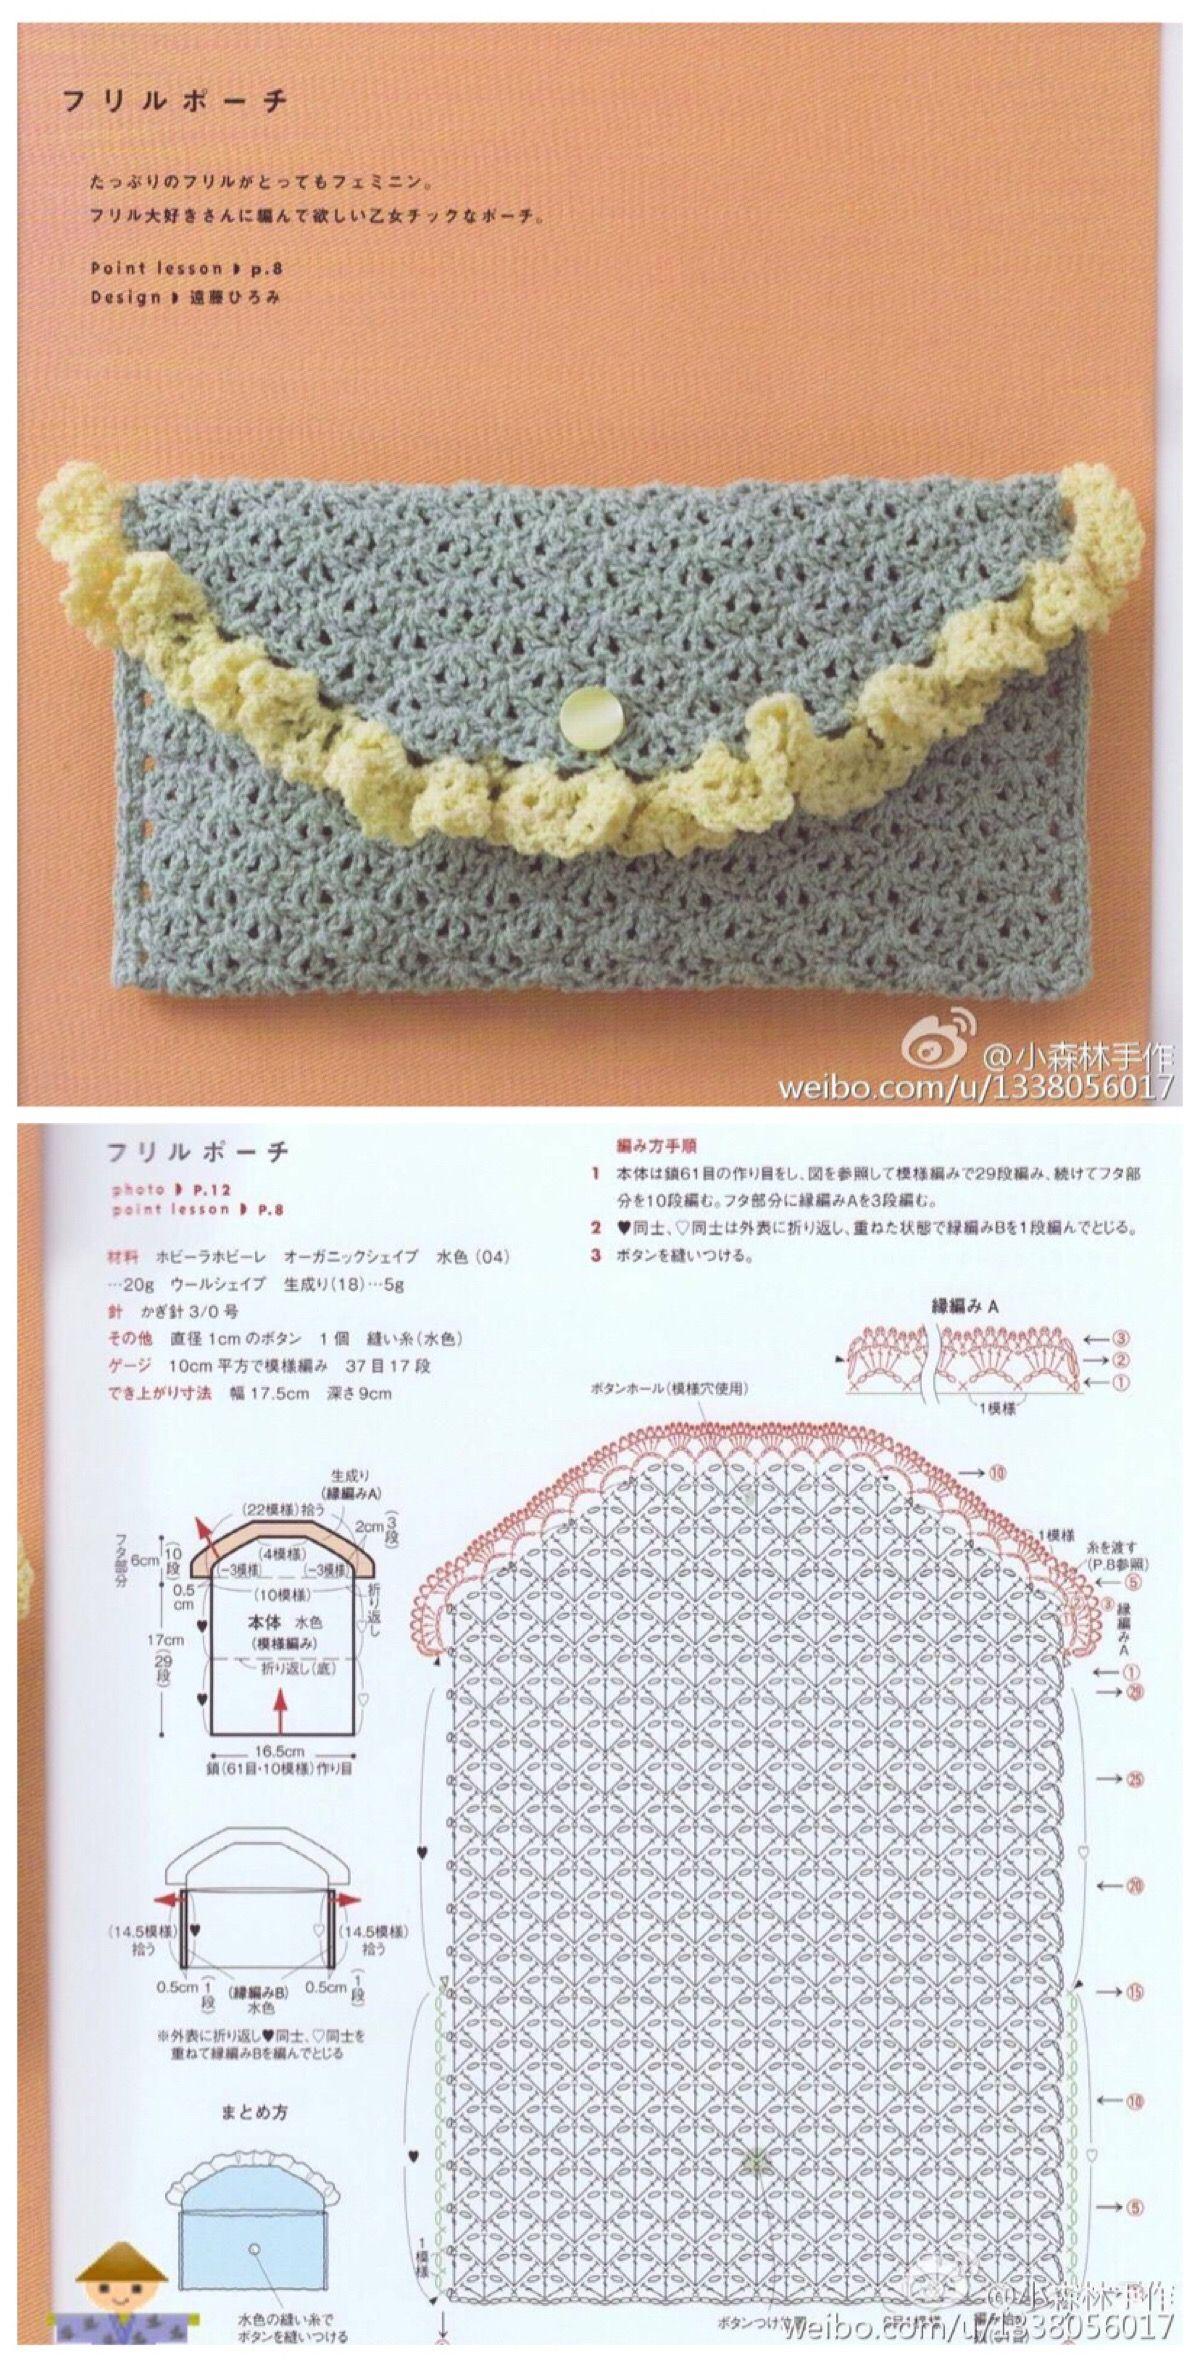 crochet diagram for cute clutch purse  [ 1200 x 2371 Pixel ]